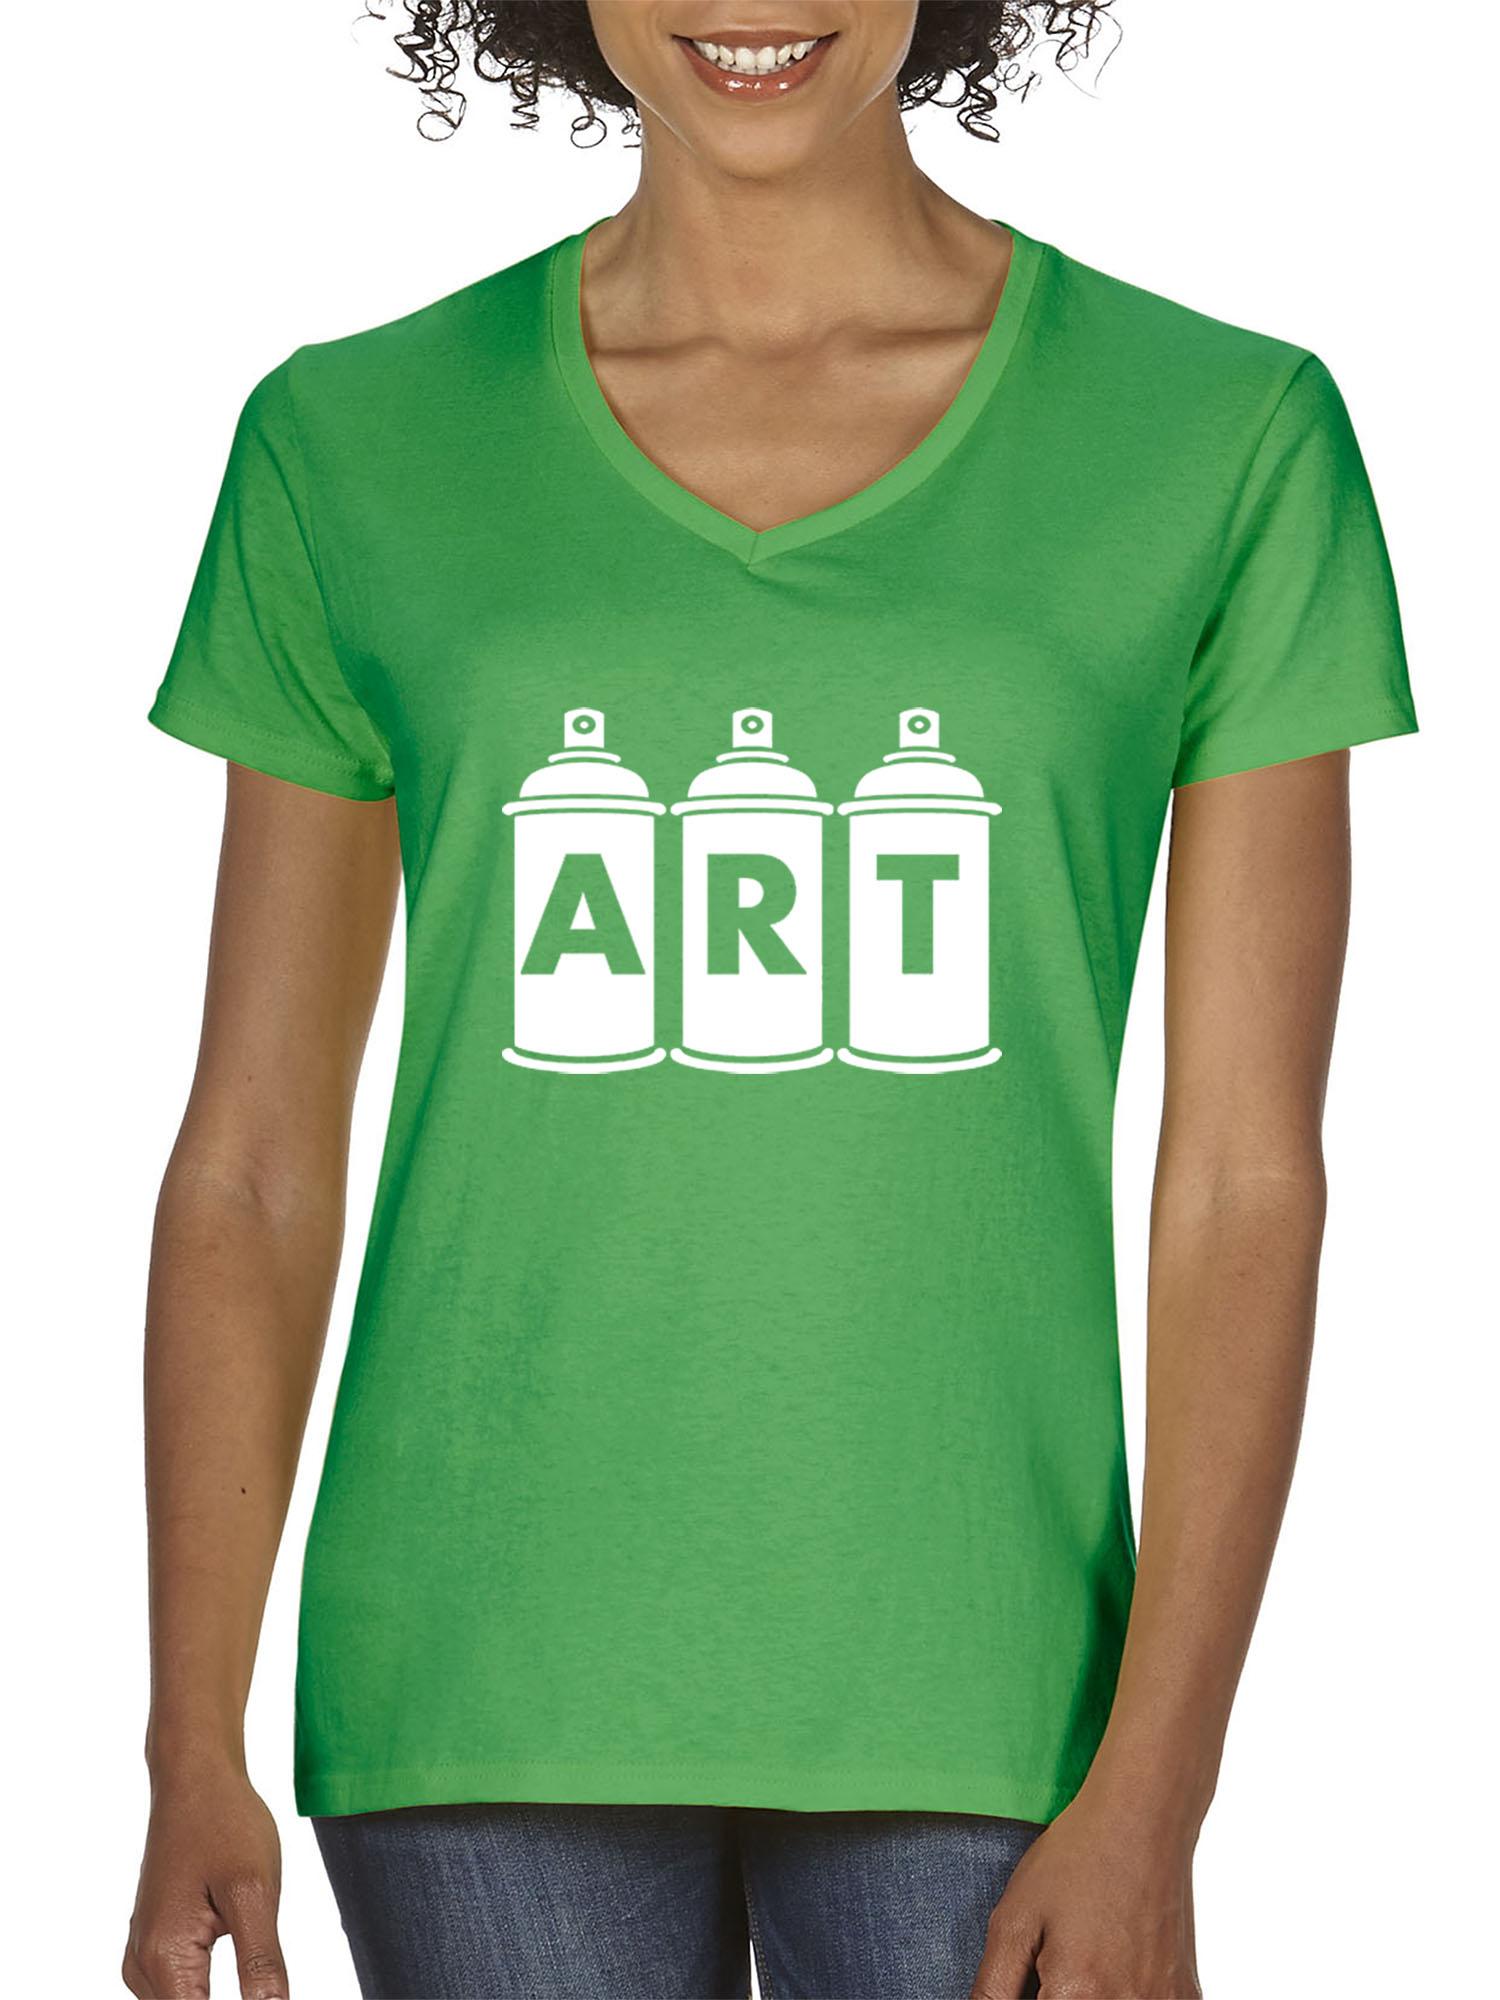 New Way New Way 926 Womens V Neck T Shirt Art Graffiti Spray